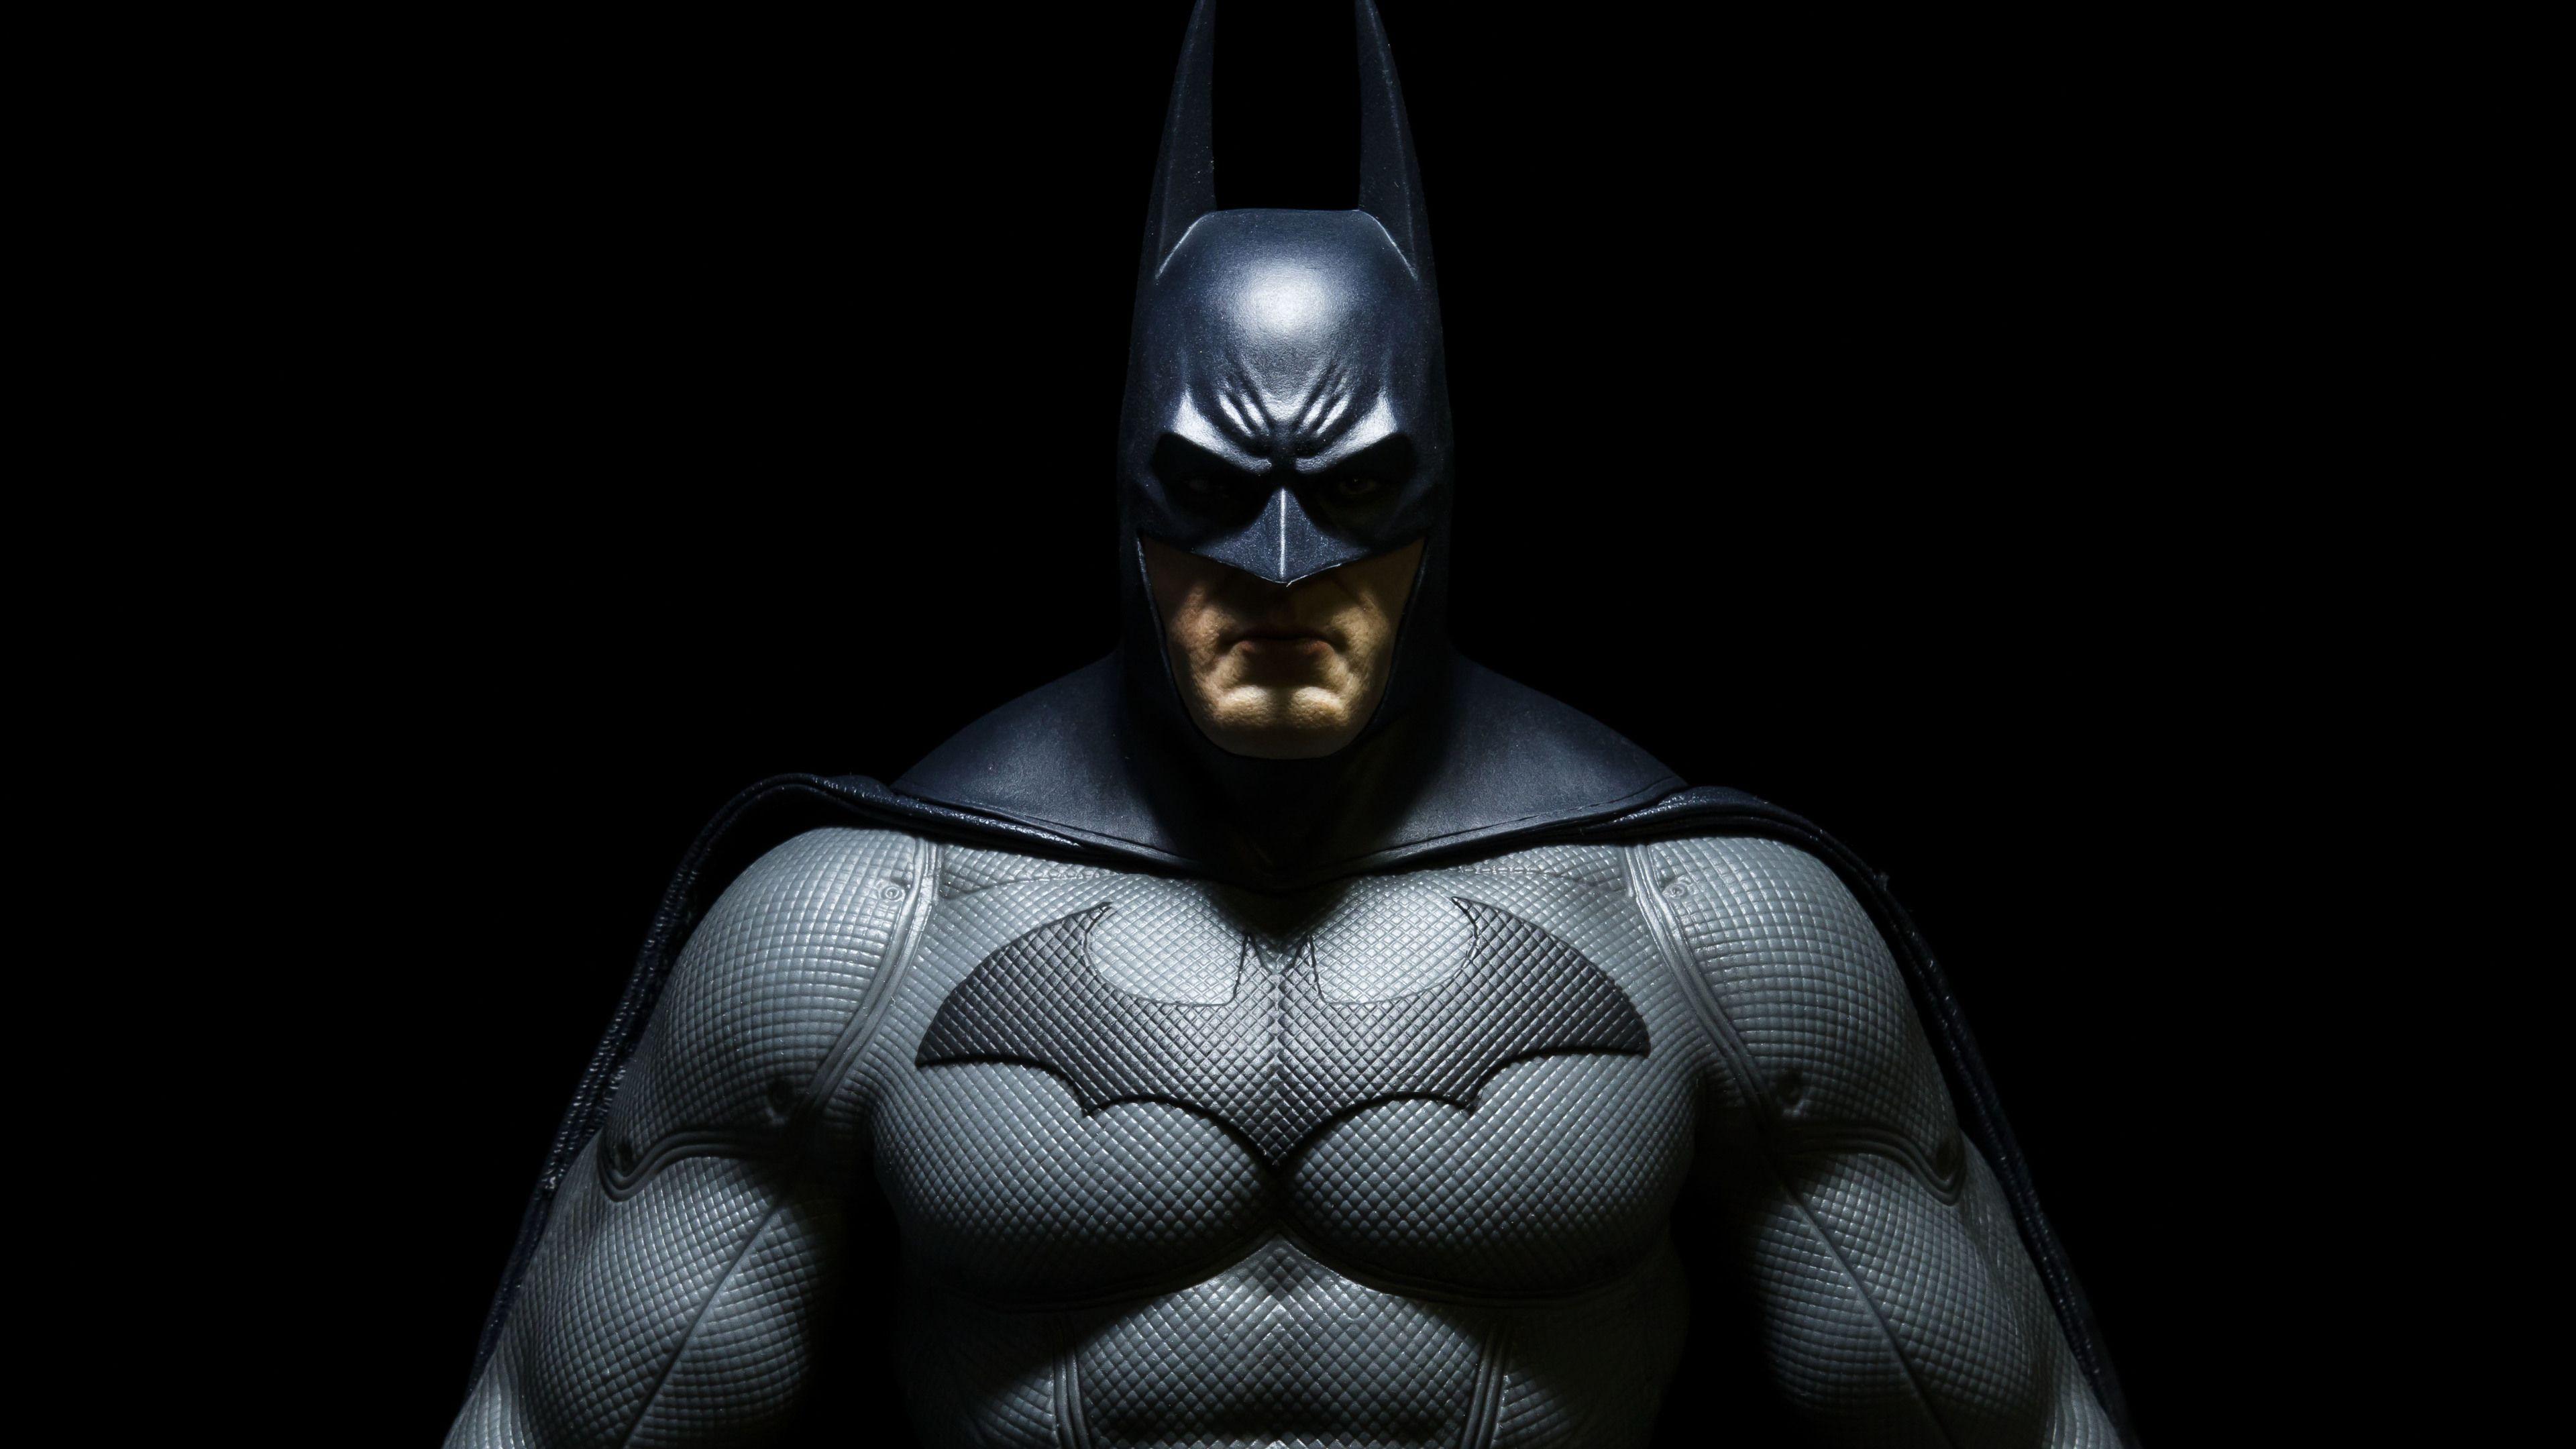 4k Batman Artworks Superheroes Wallpapers Hd Wallpapers Digital Art Wallpapers Deviantart Wallpapers Batman W Batman Wallpaper Batman Artwork Uhd Wallpaper